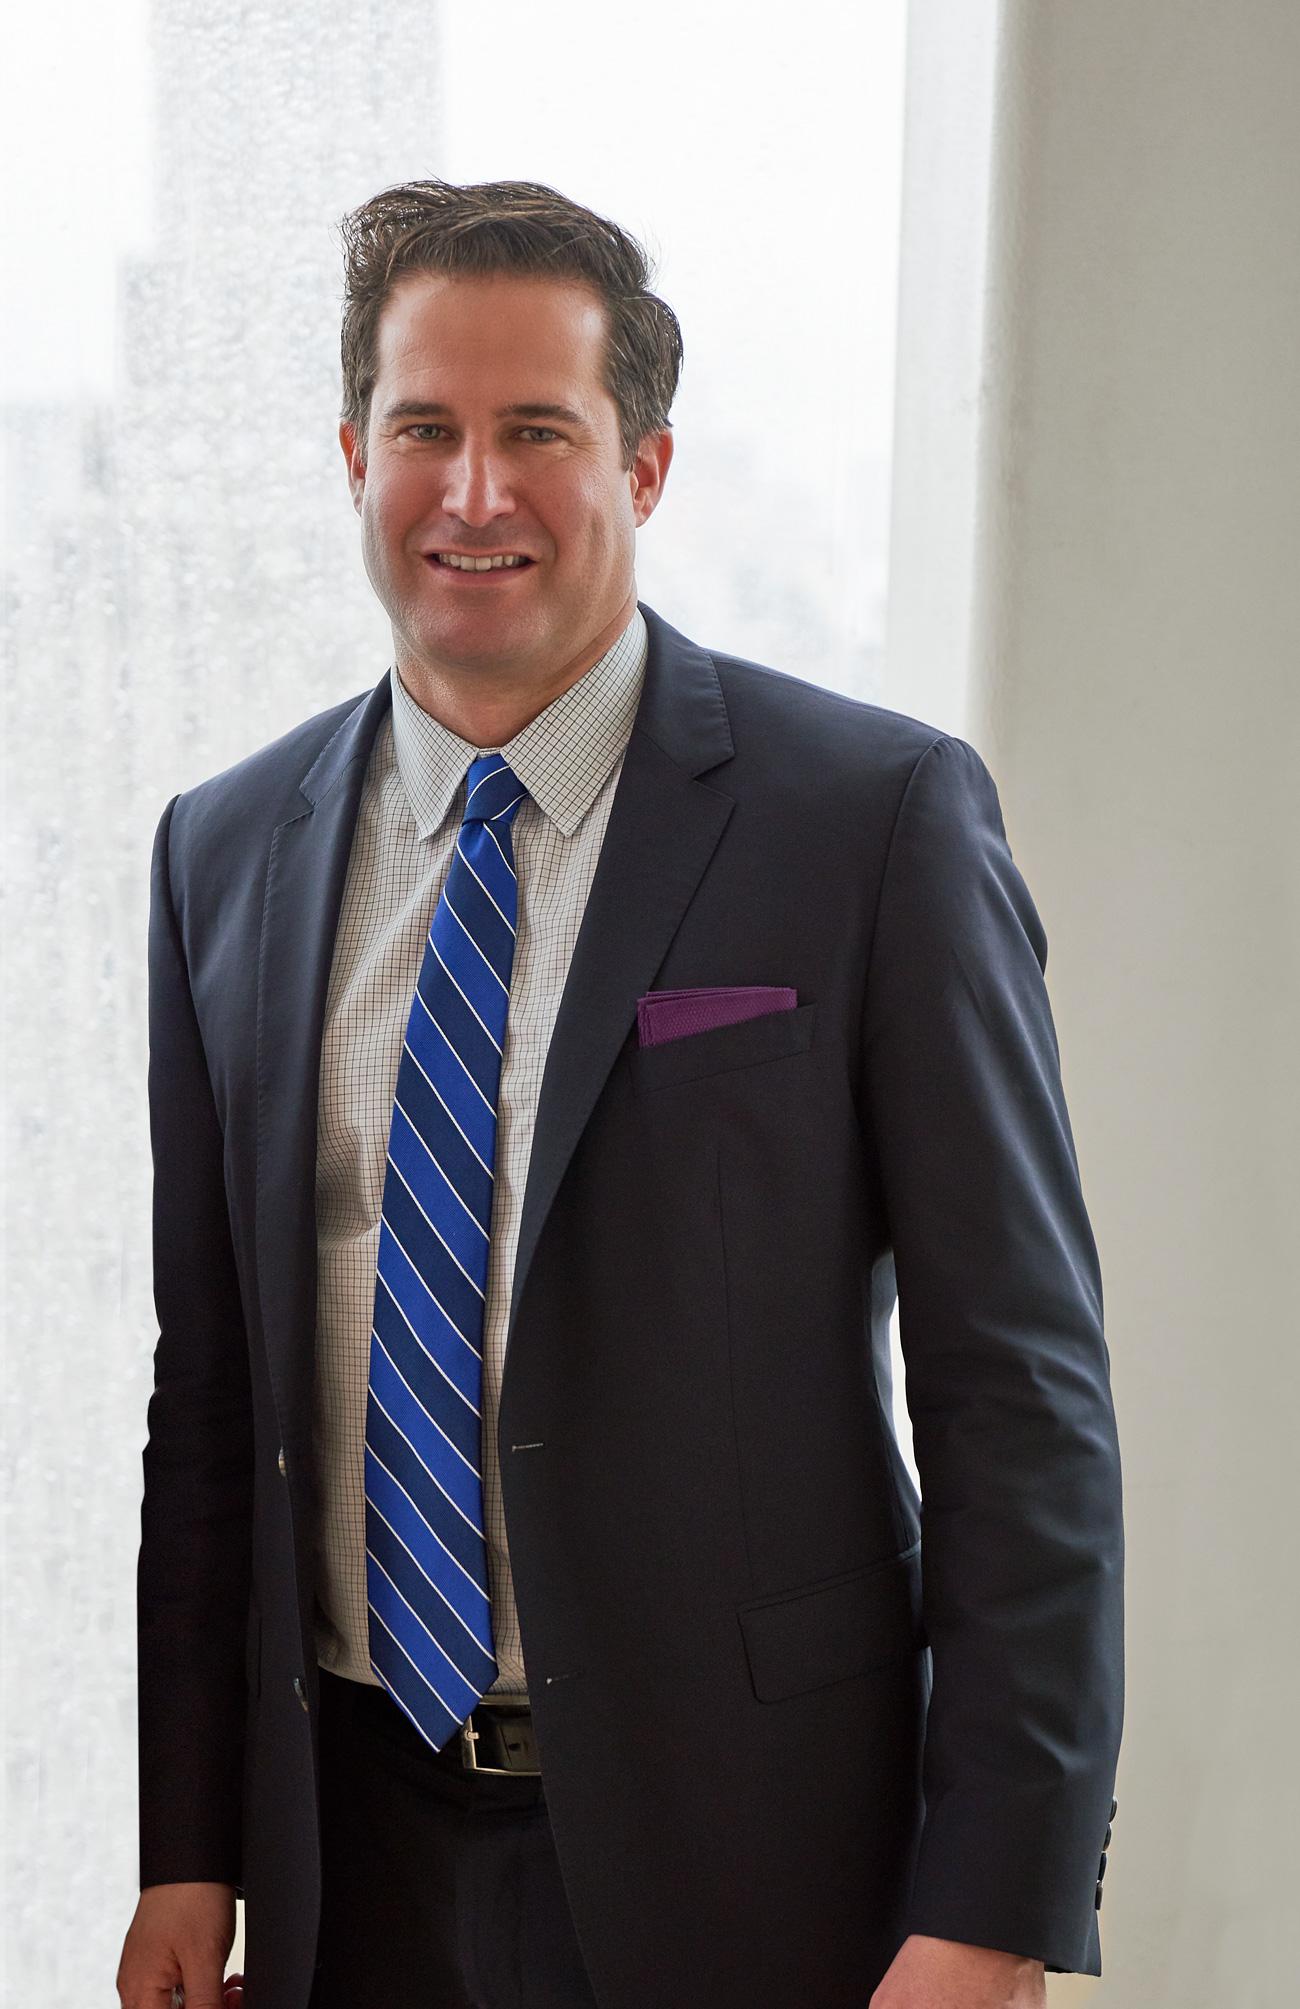 U.S. Representative Seth Moulton , 6th Congressional District of Massachusetts.